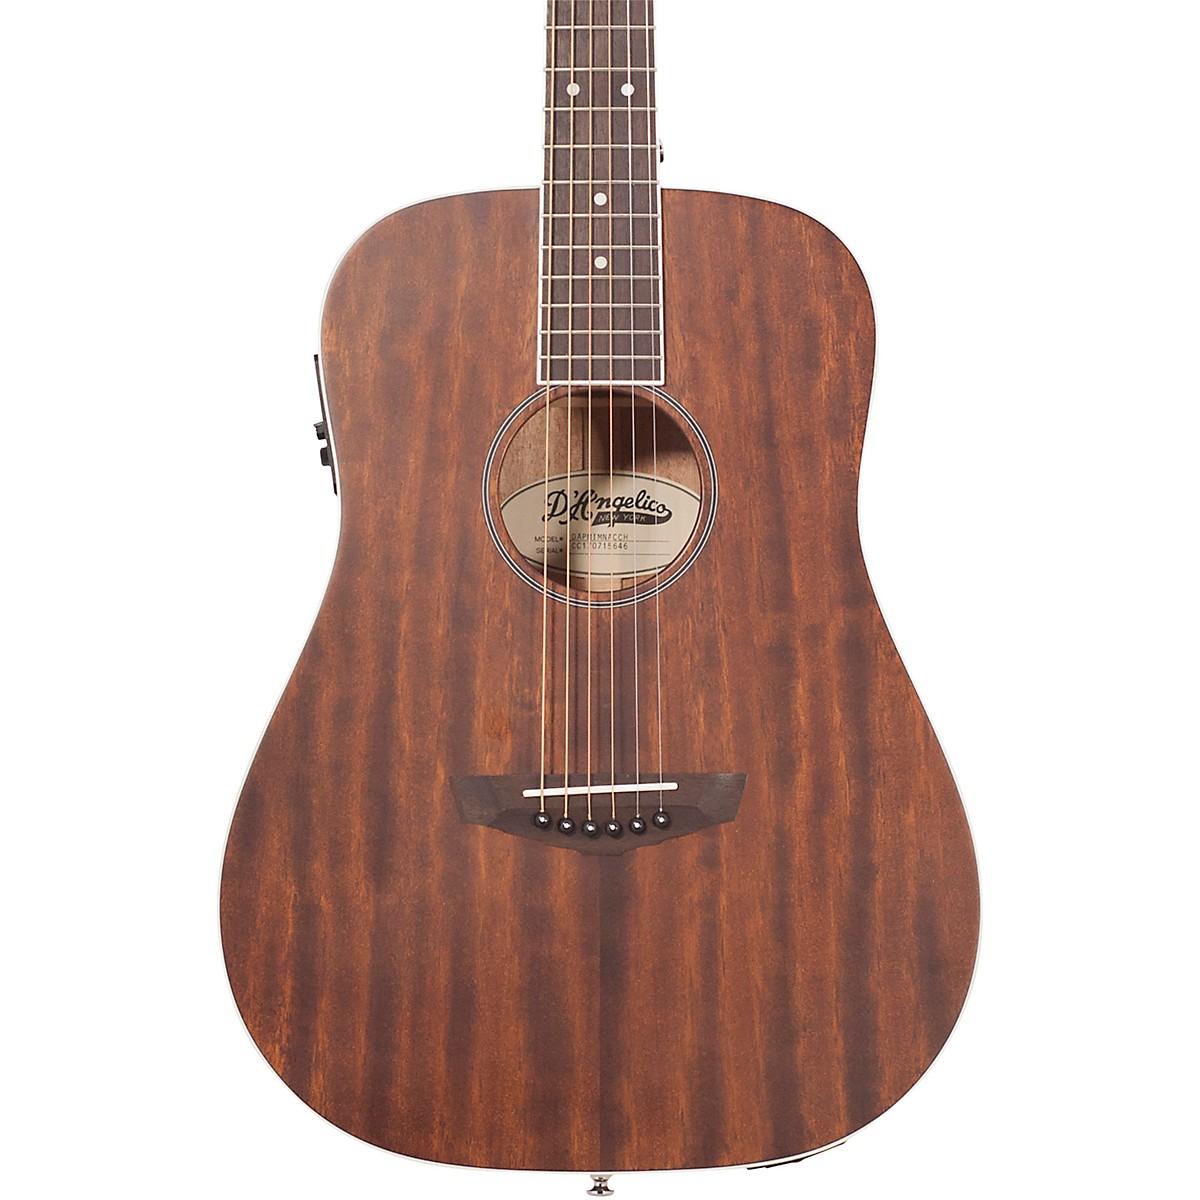 D'Angelico Premier Niagara Mahogany Mini Dreadnought Acoustic-Electric Guitar